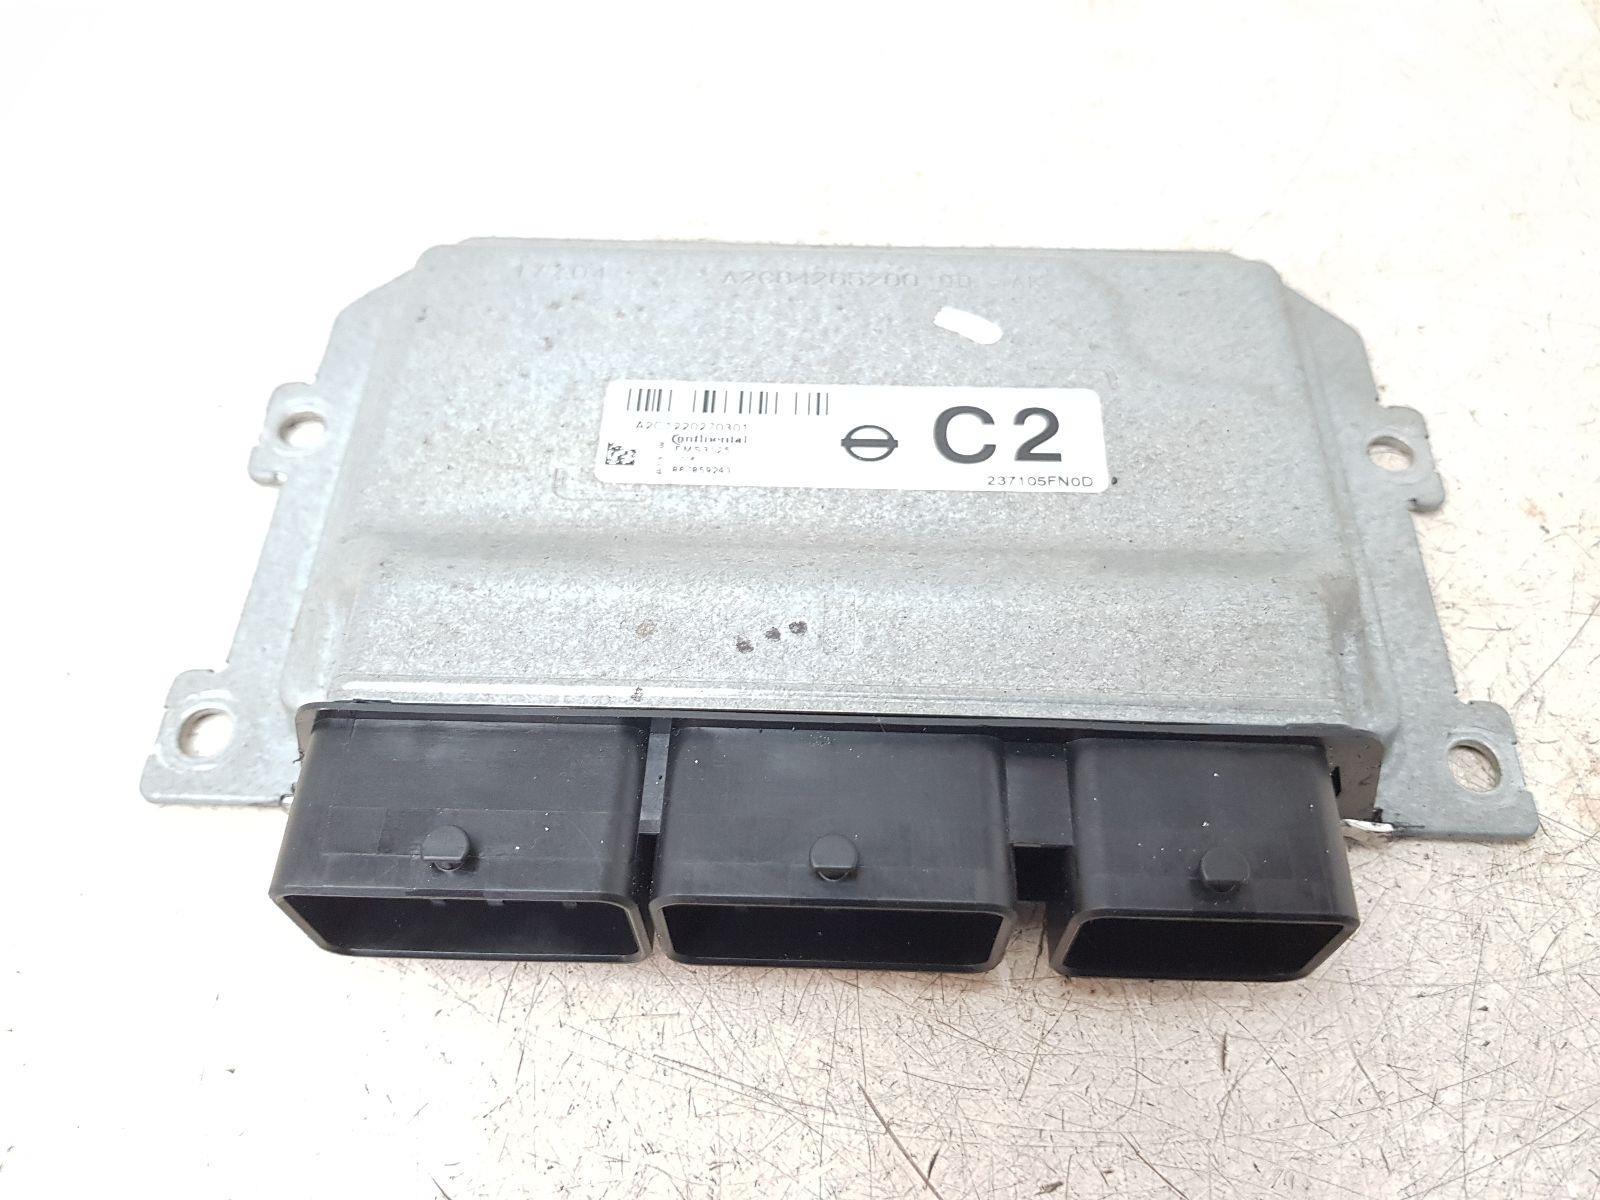 2017 On MK5 NISSAN MICRA K14 ENGINE ECU 0.9 PETROL H4B408 237105FN0D